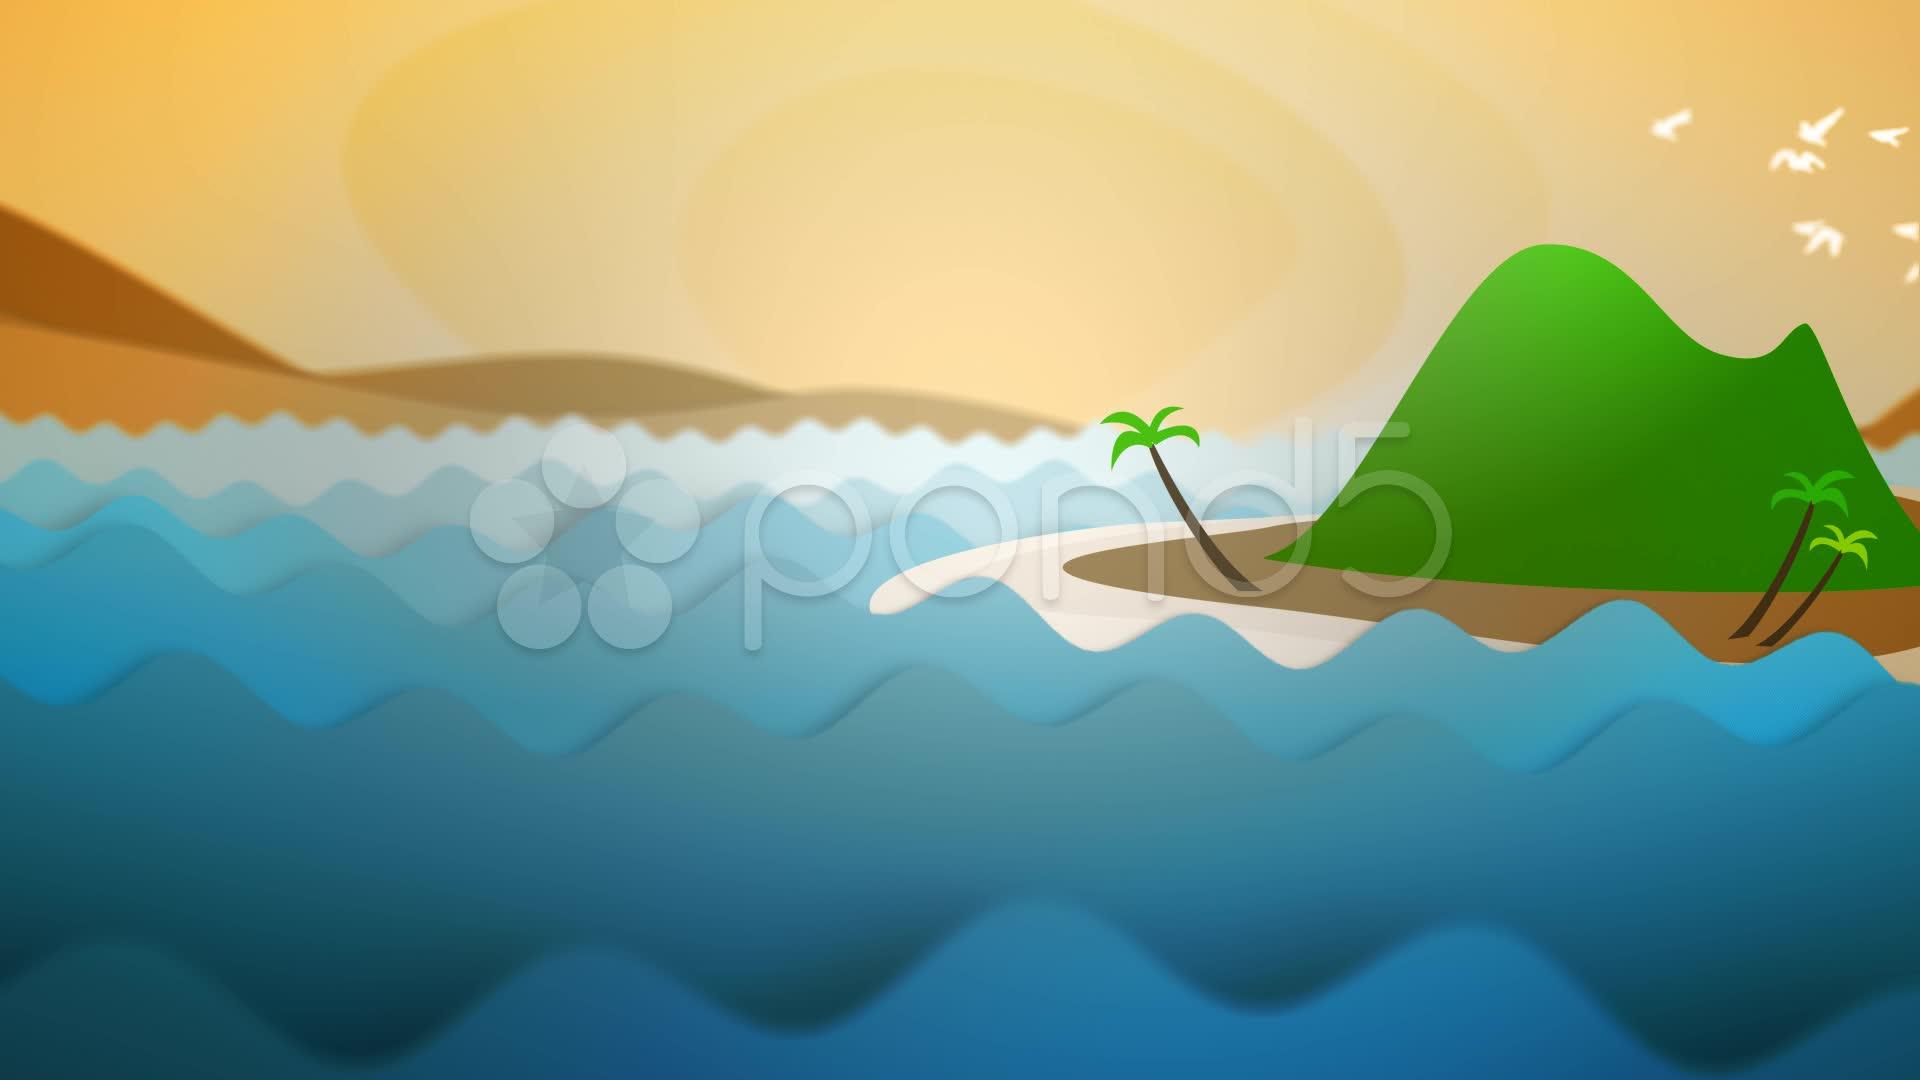 Drawn islet animated #12411682 Island Sunset Cartoon Sunset